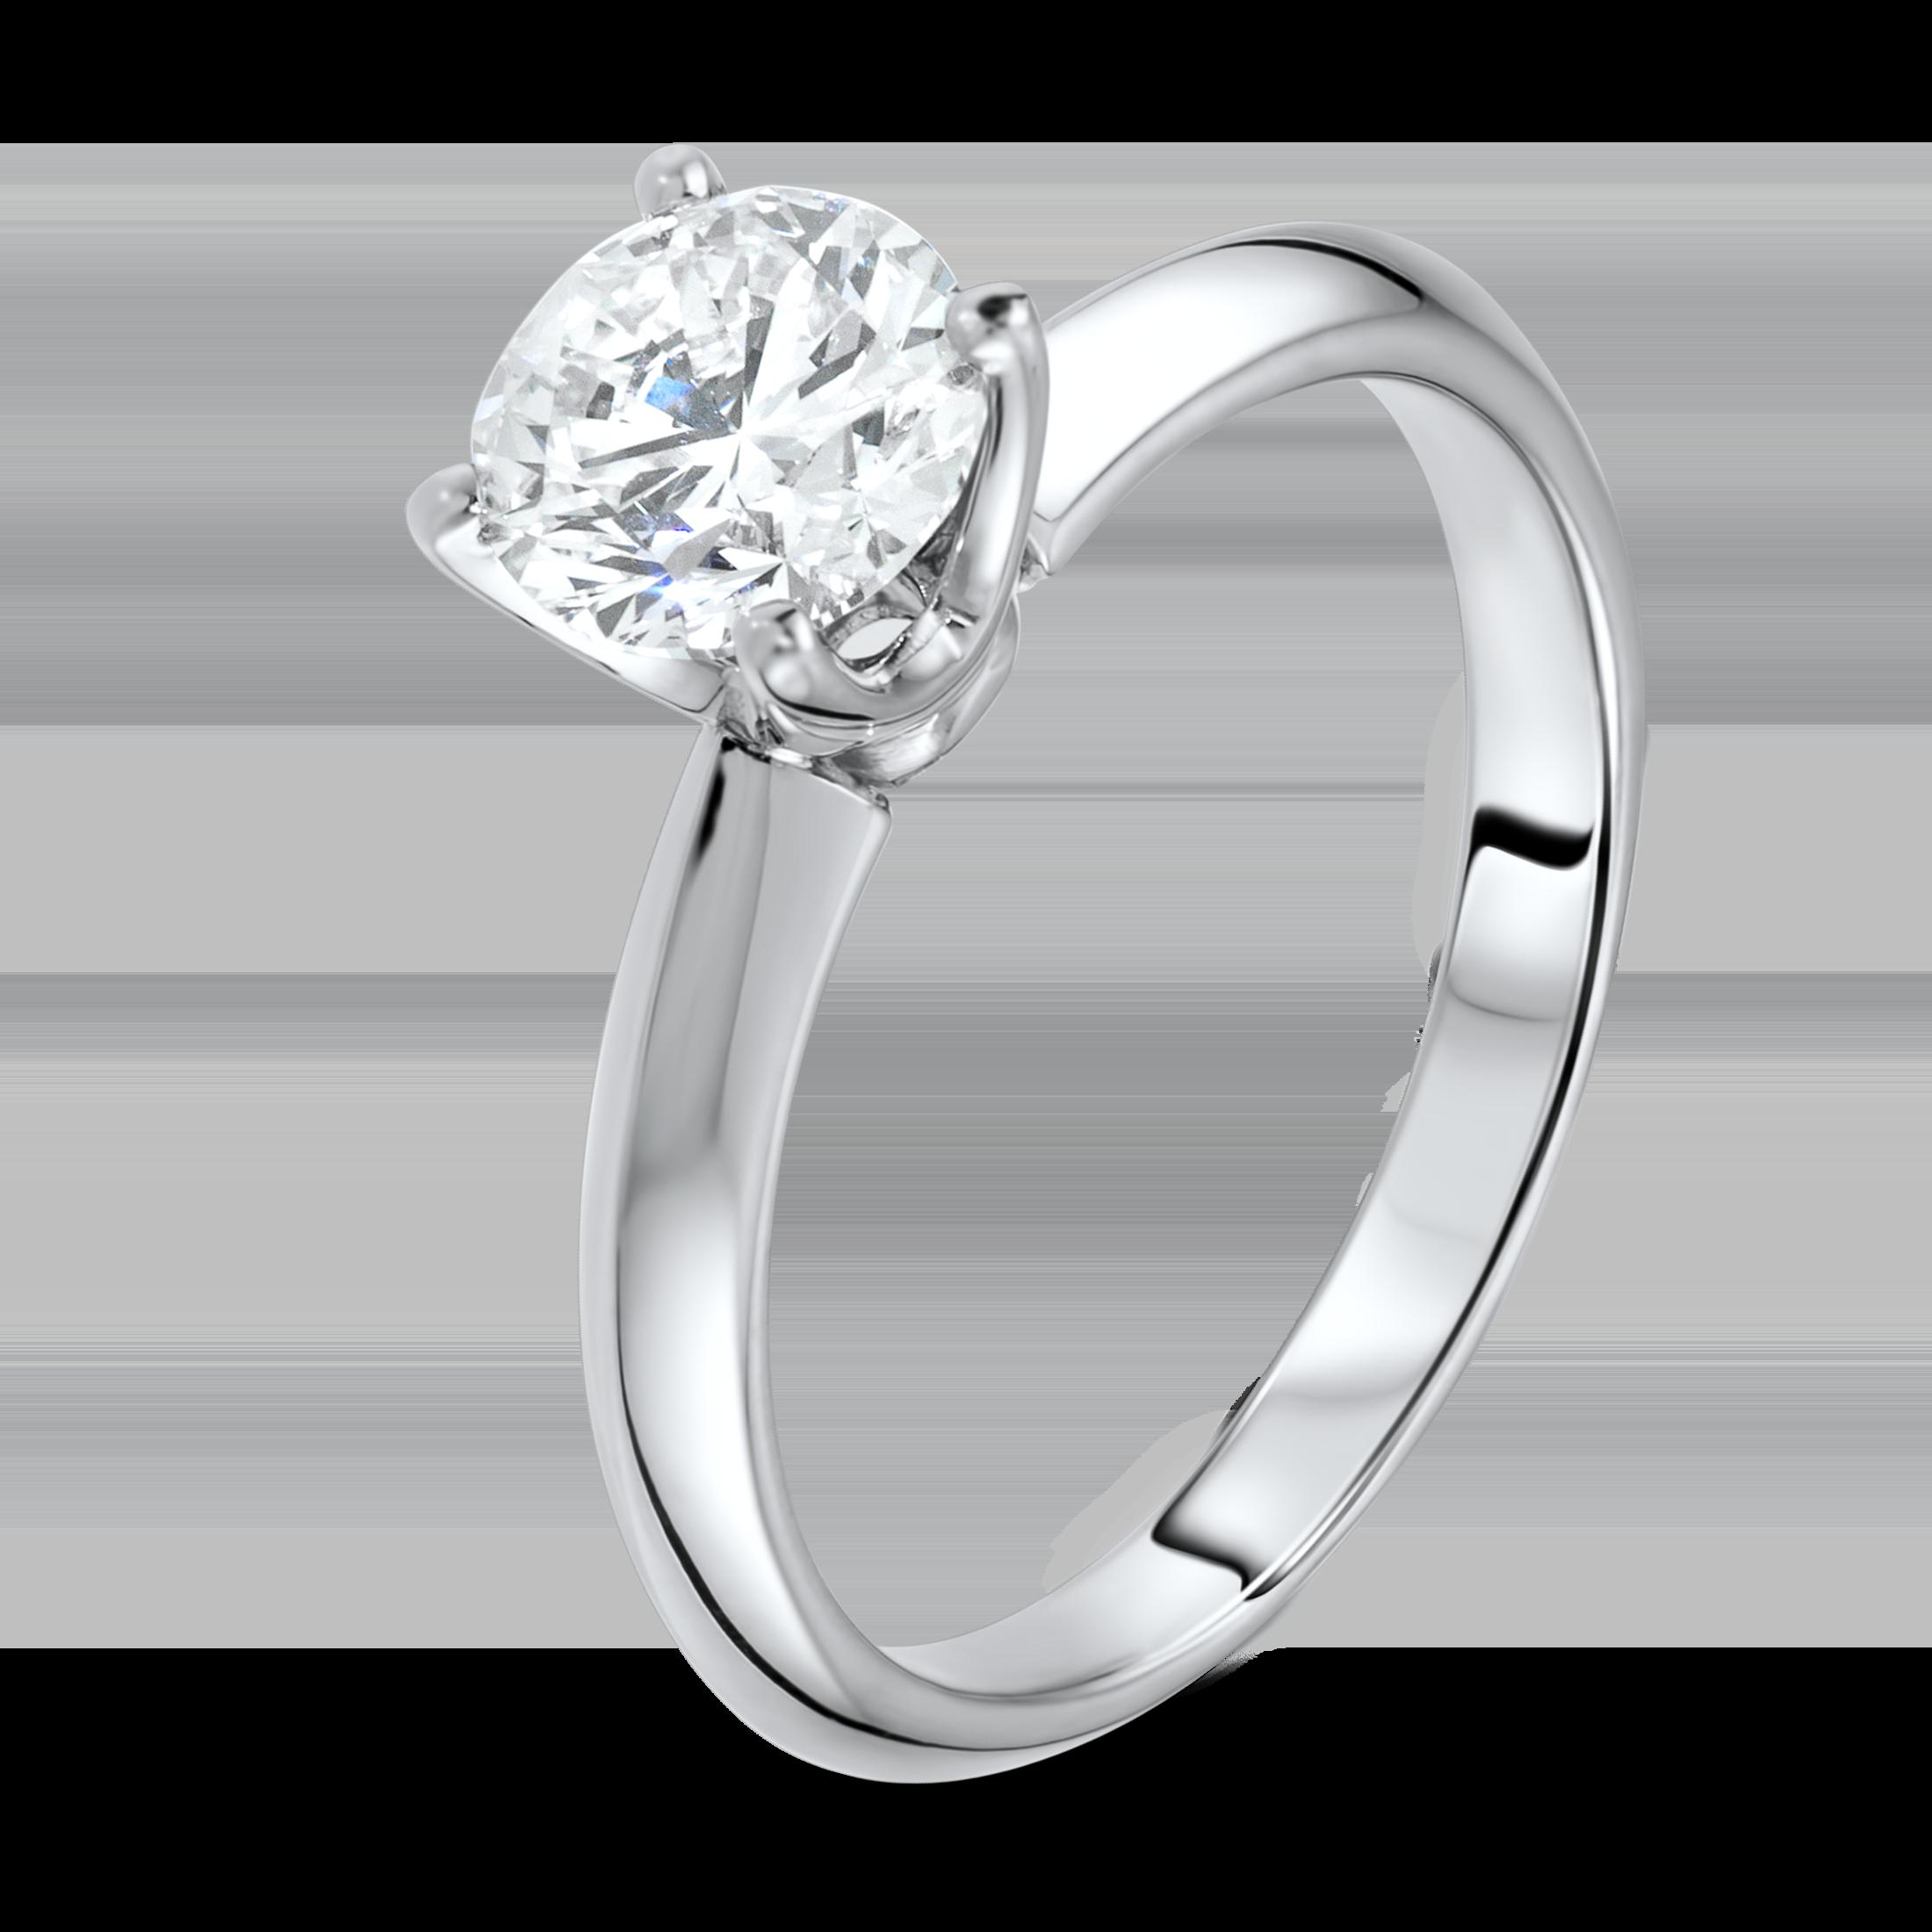 Ring PNG - 15925